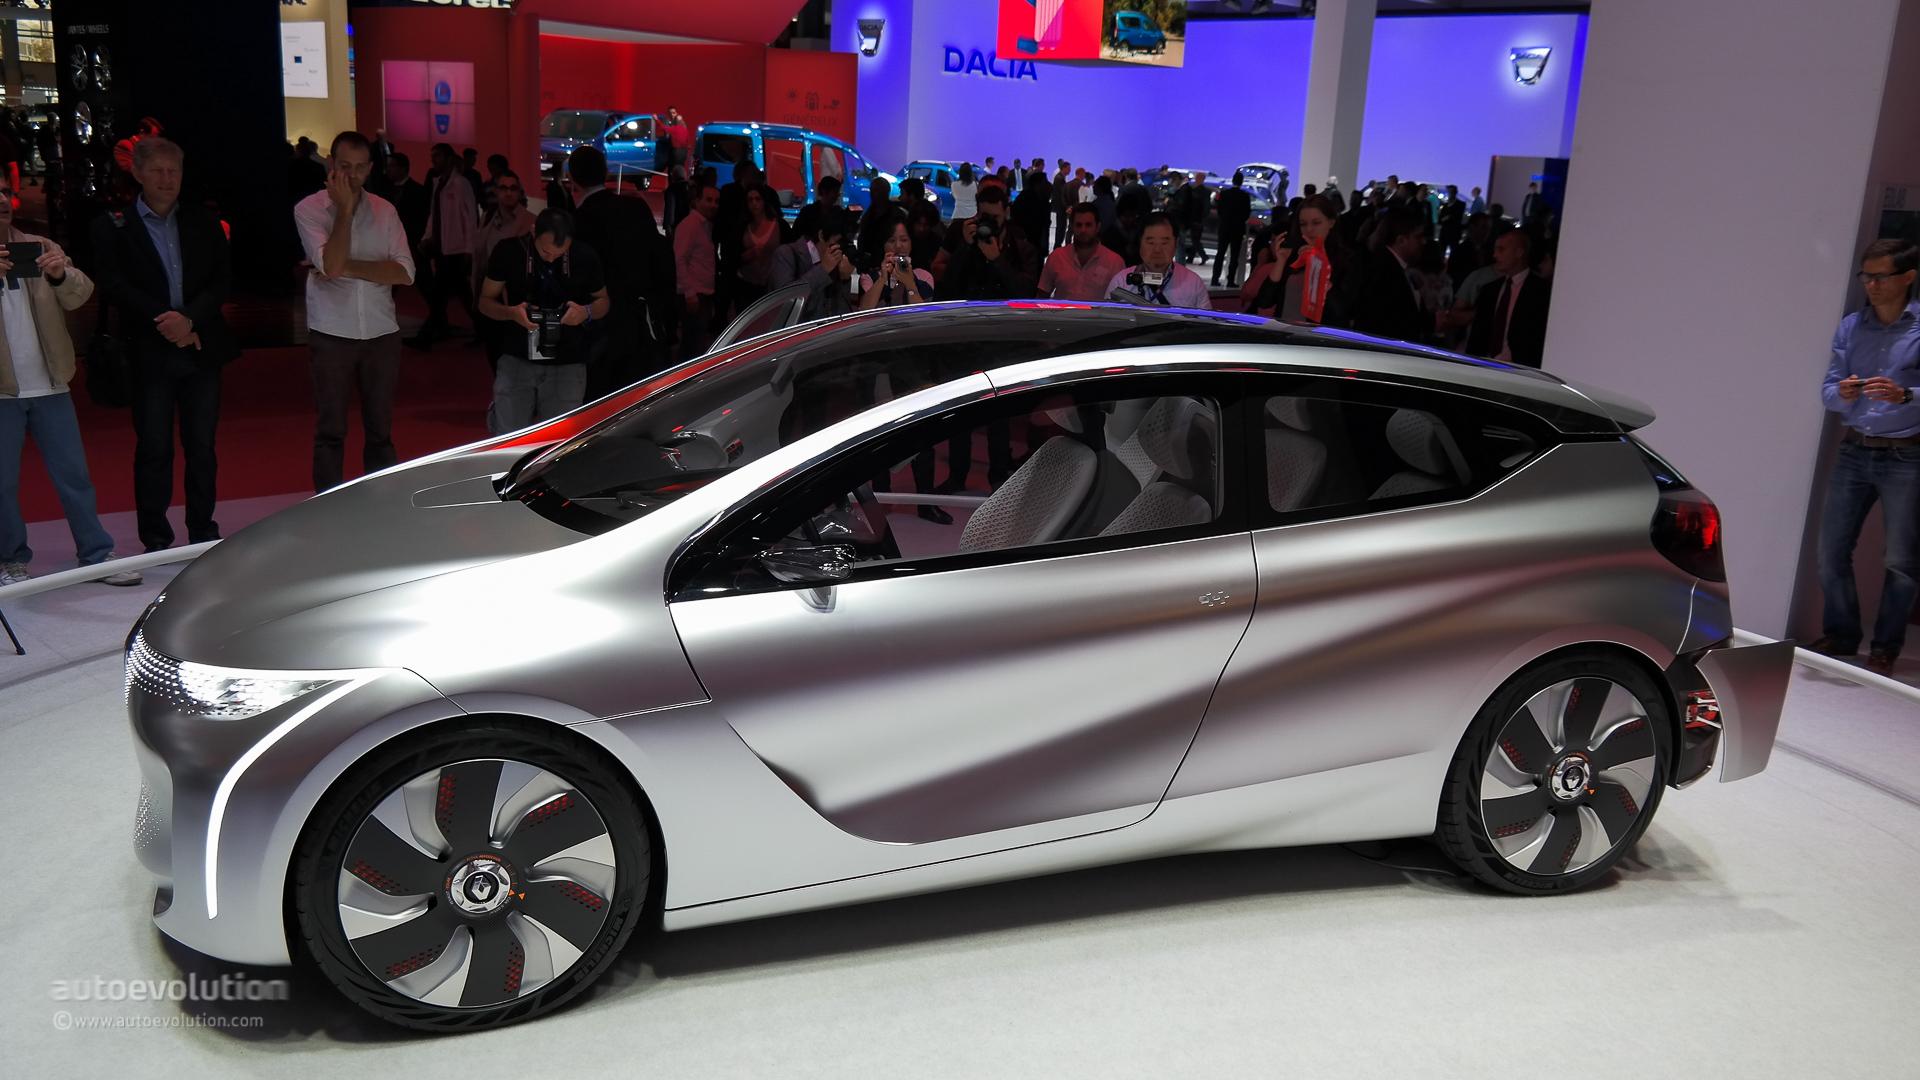 Renault prepares ev surprise for 2017 geneva motor show - Auto motor show ...